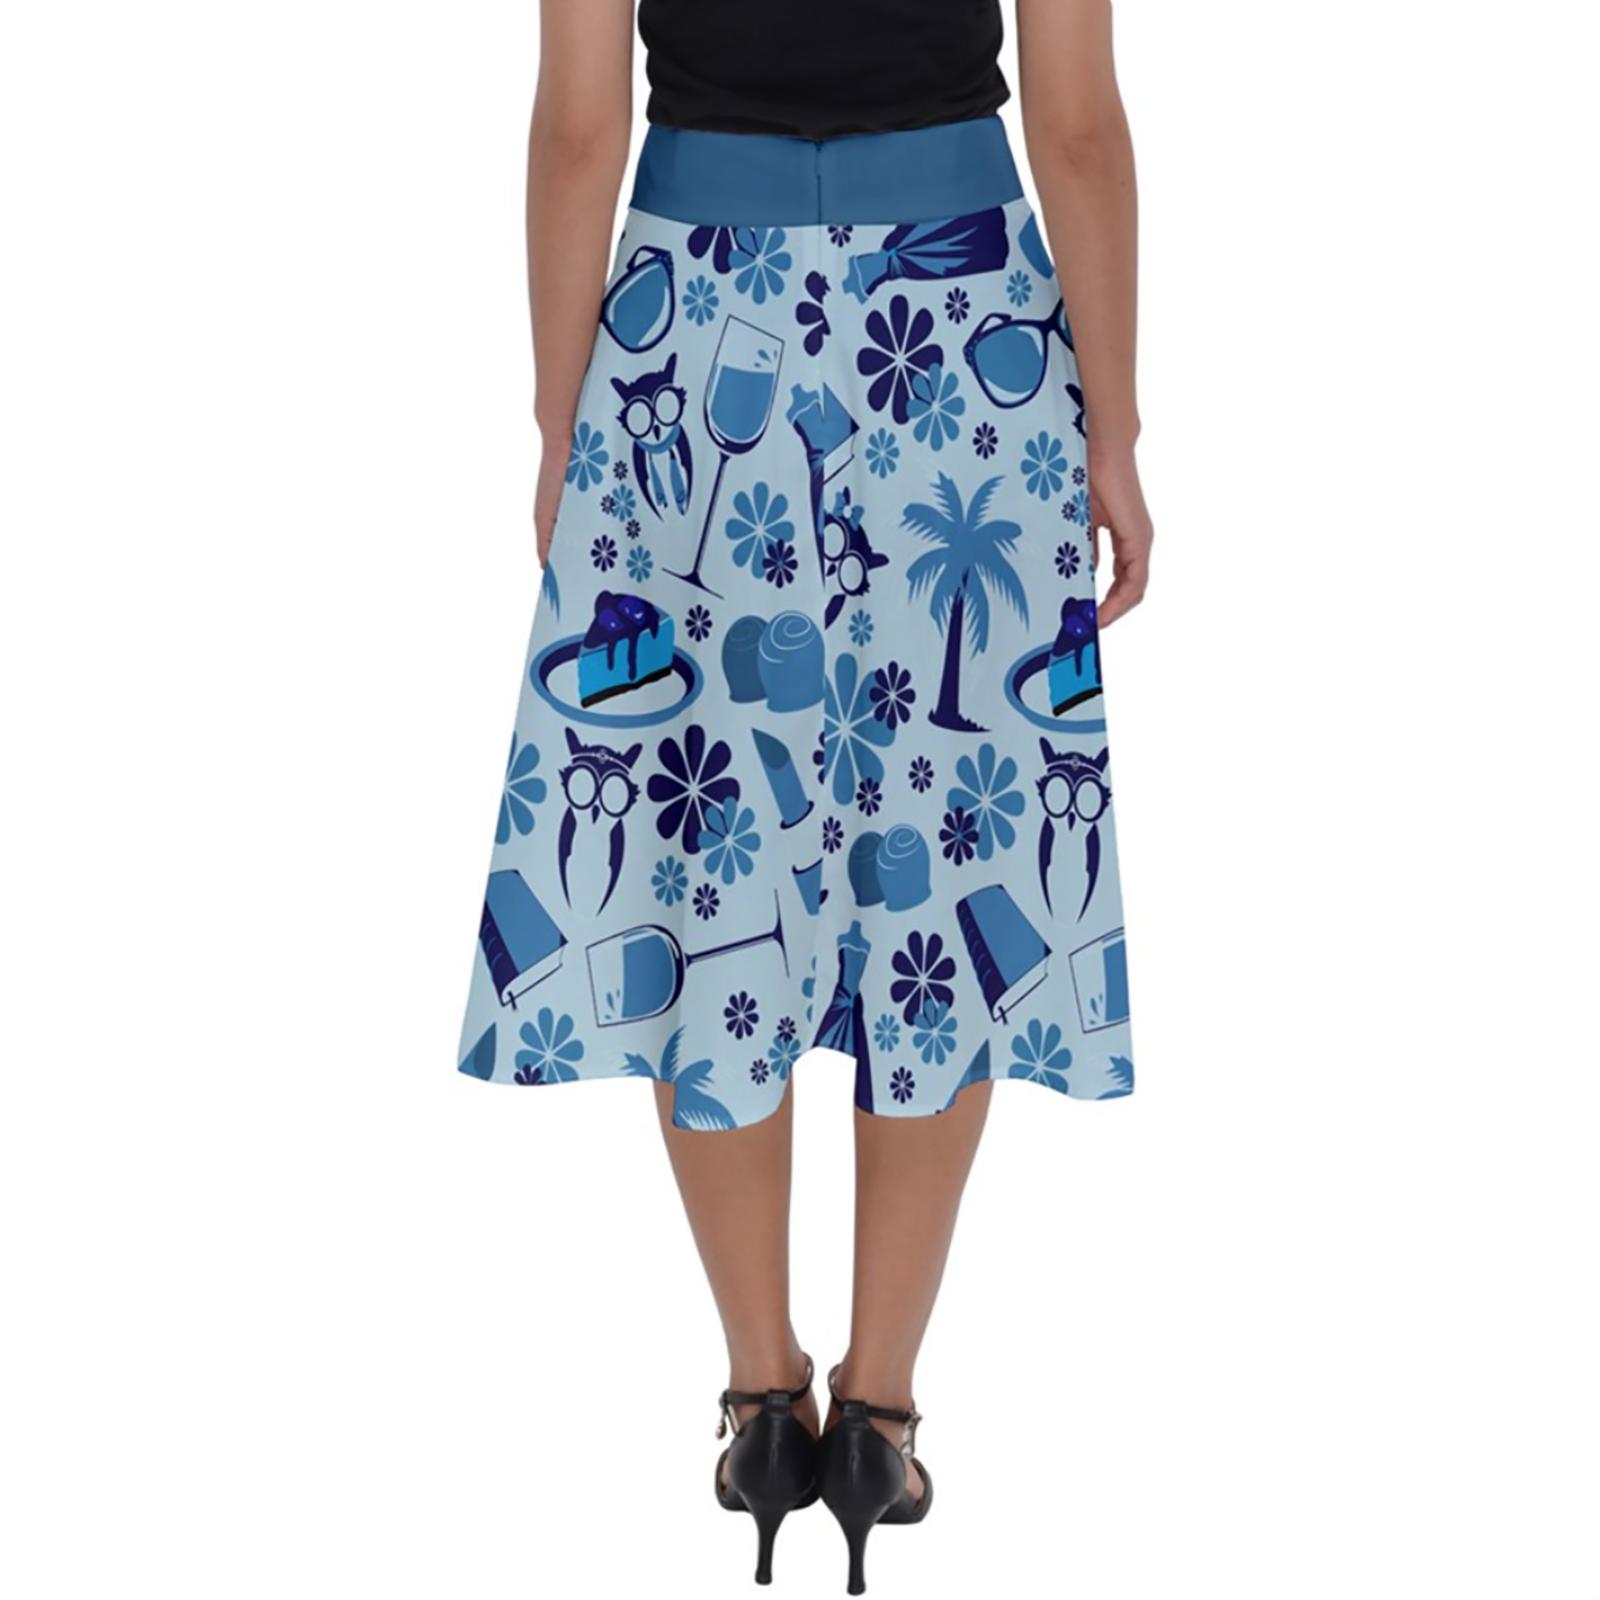 Self-Care Perfect Length Midi Skirt (Blue)